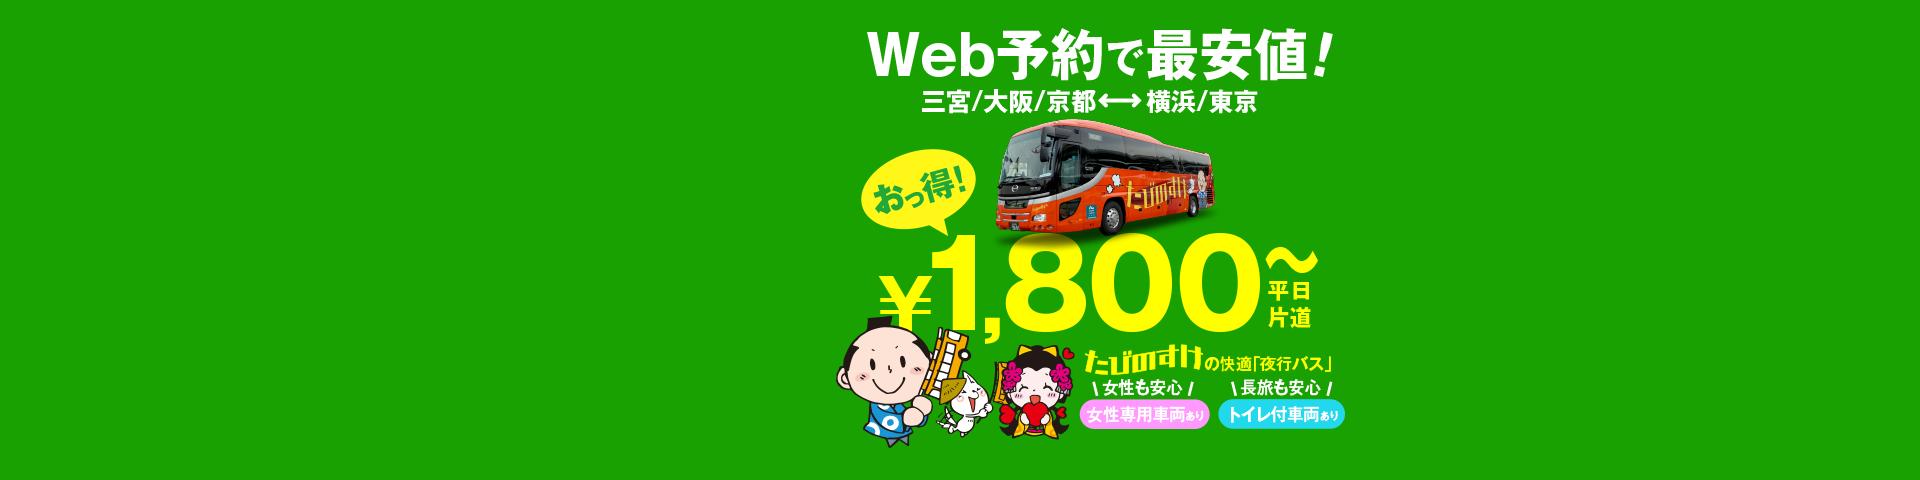 Web予約 1800円〜